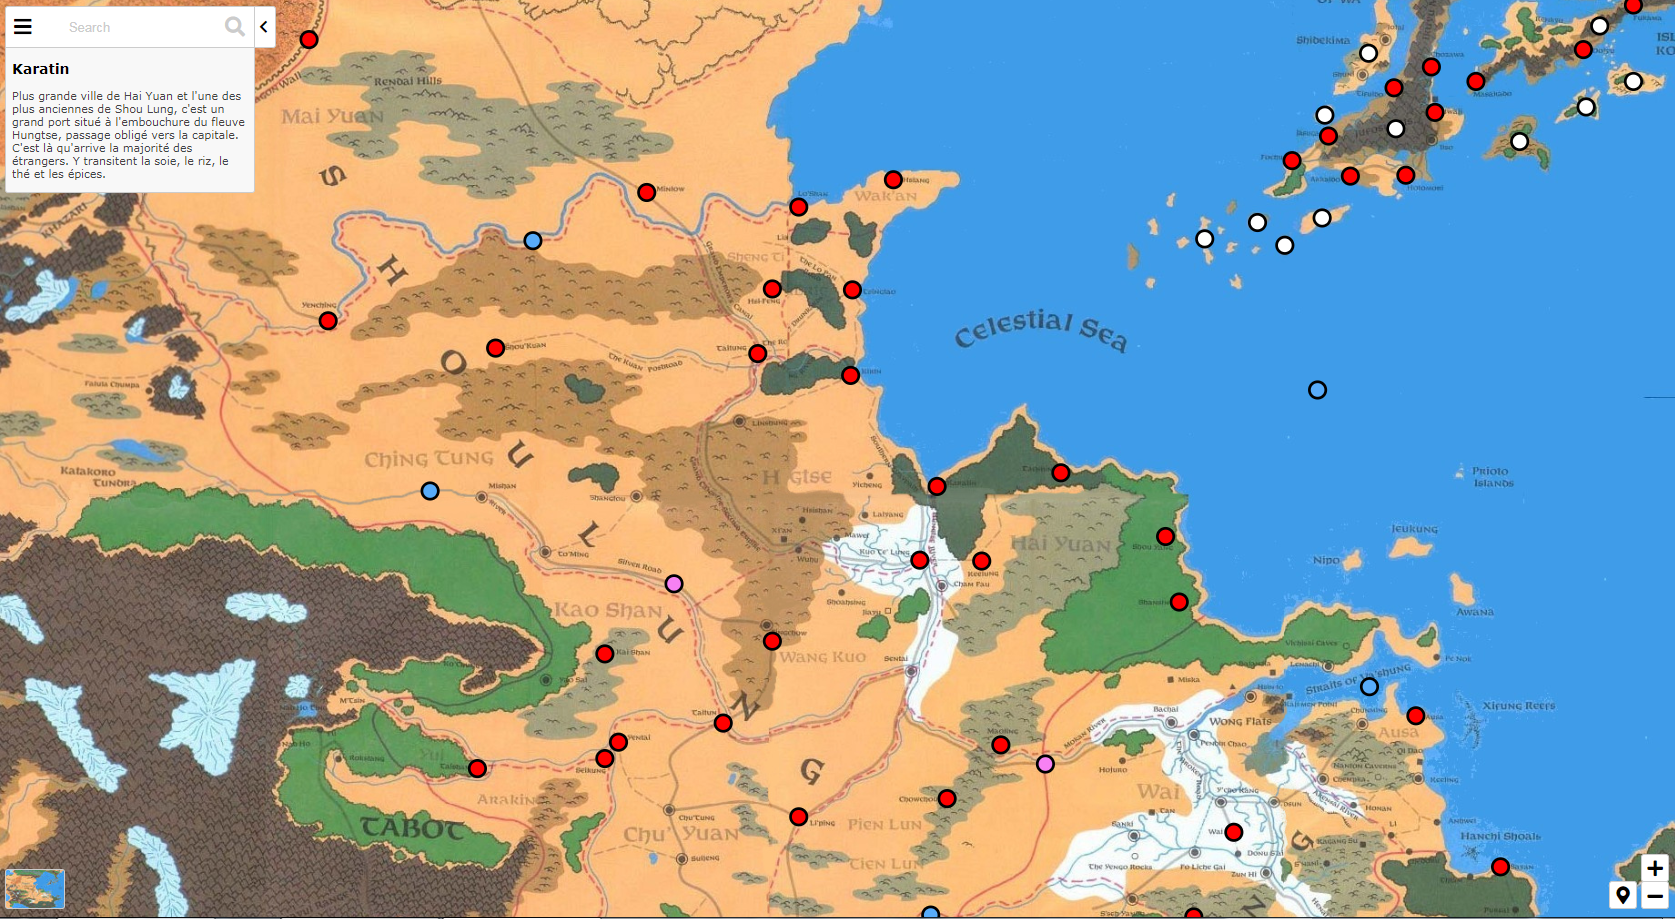 Kara-Tur D&D Interactive Map   Forgotten Realms Maps in 2019   Map ...